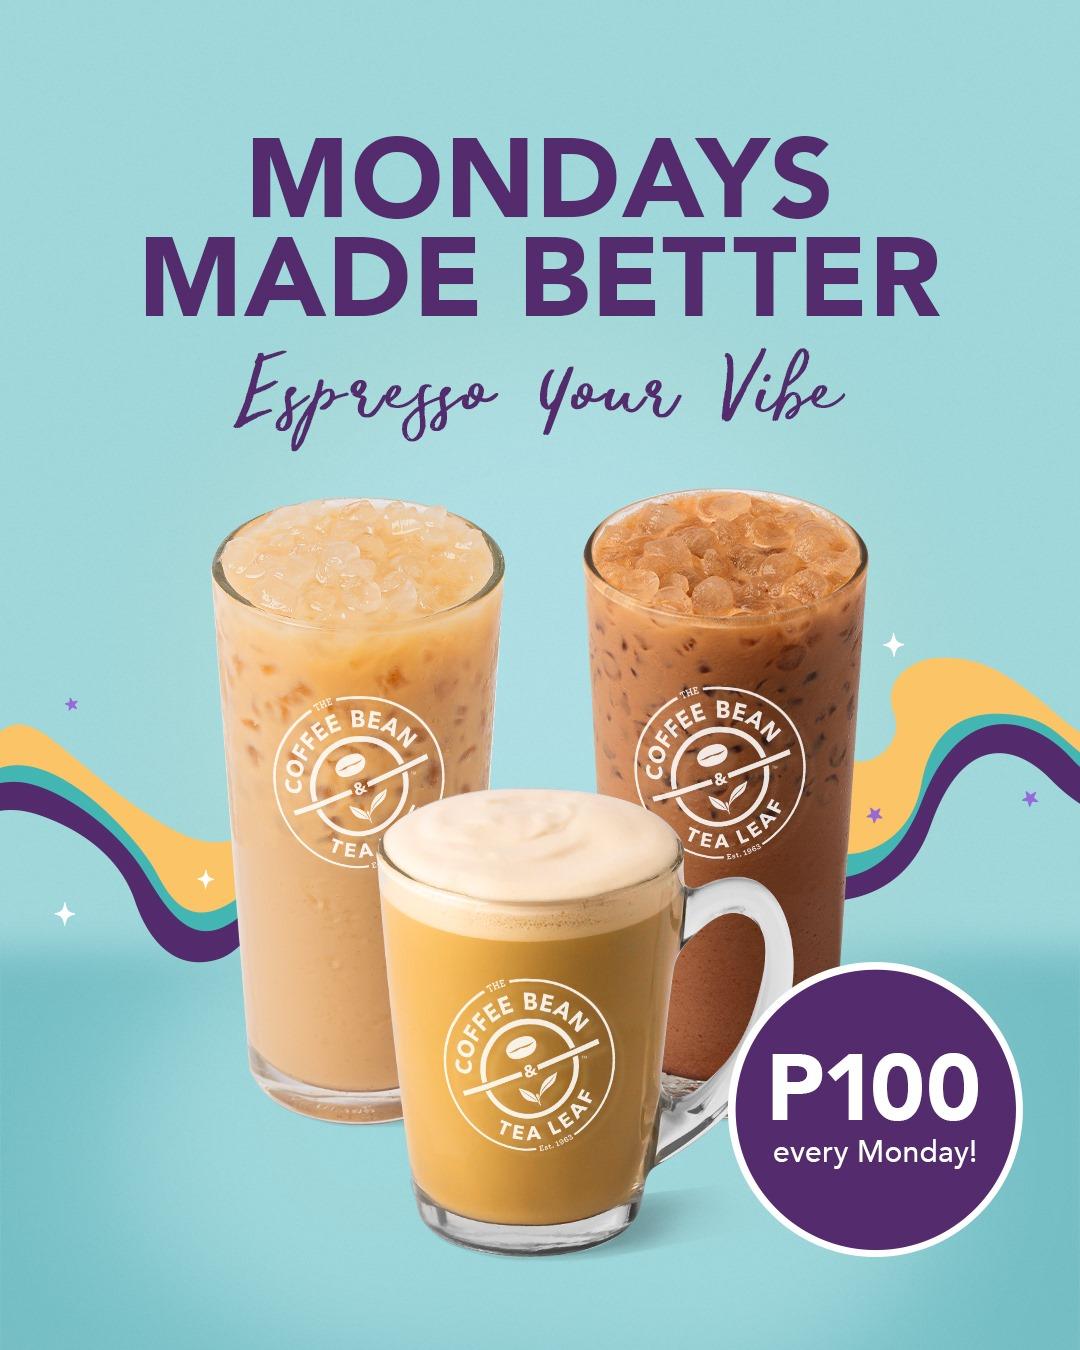 CBTL Promo Espresso your vibes with Mondays Made Better 2021